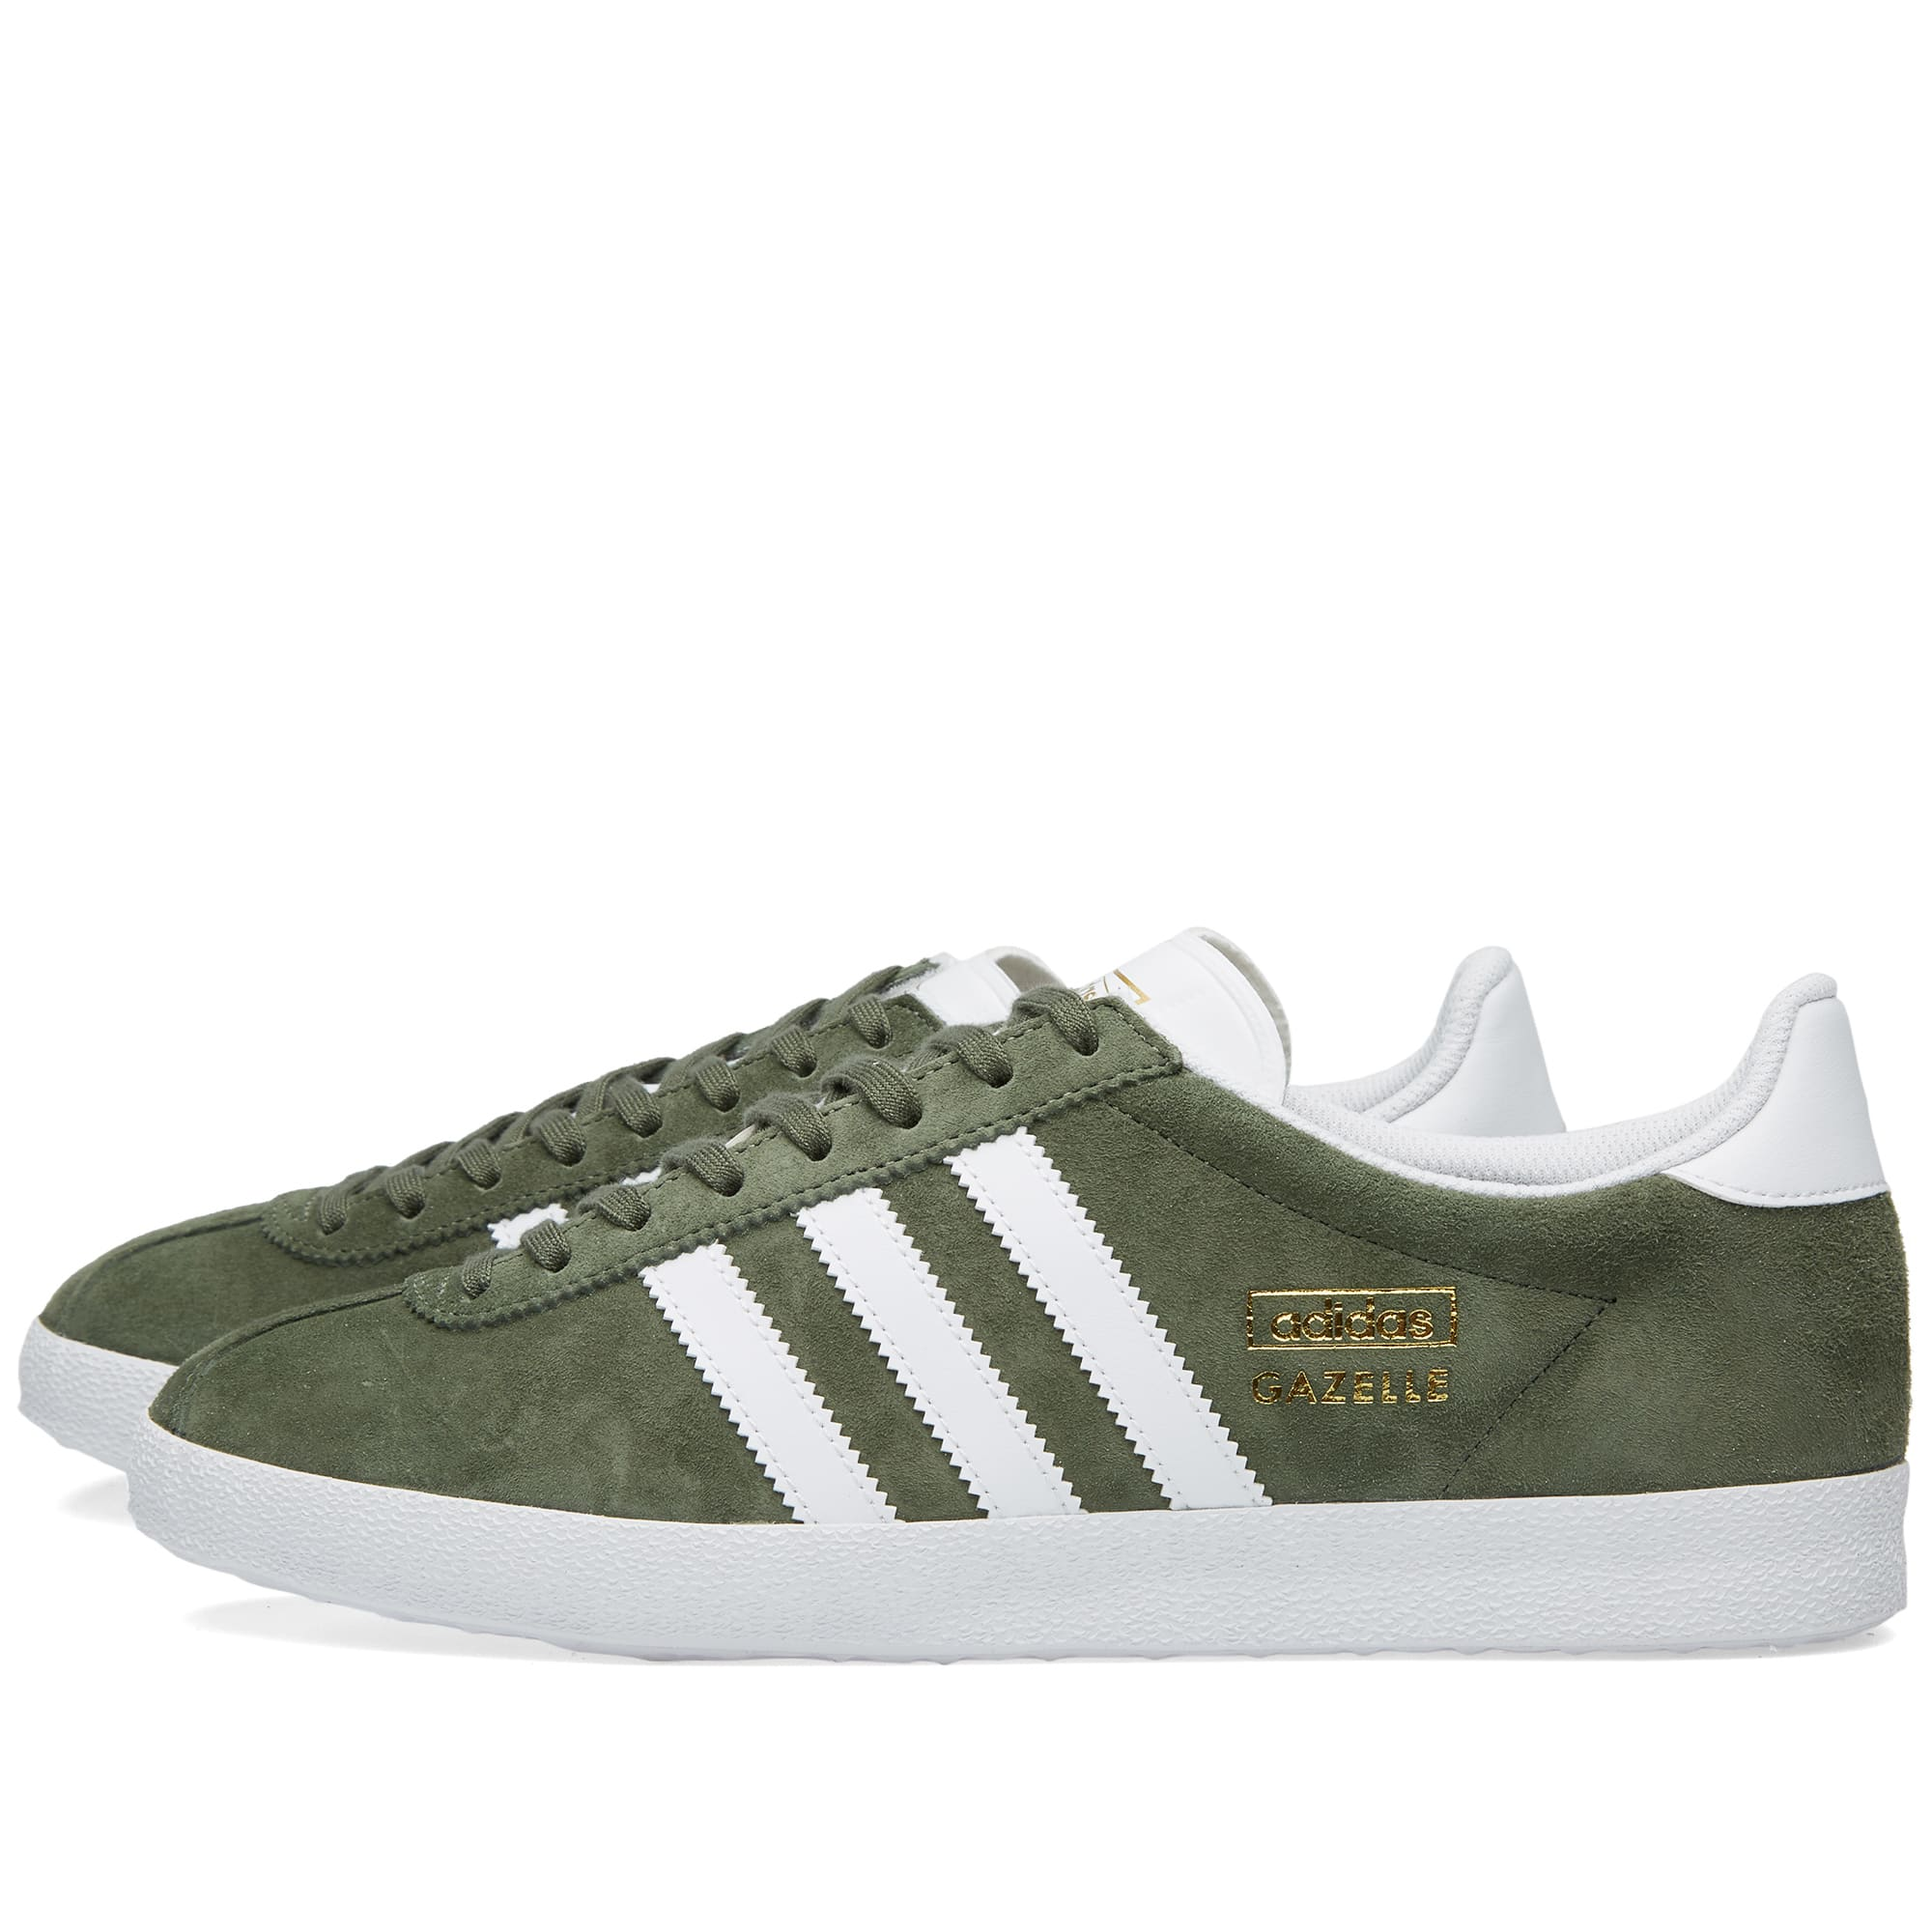 Adidas Gazelle OG Base Green \u0026 White | END.